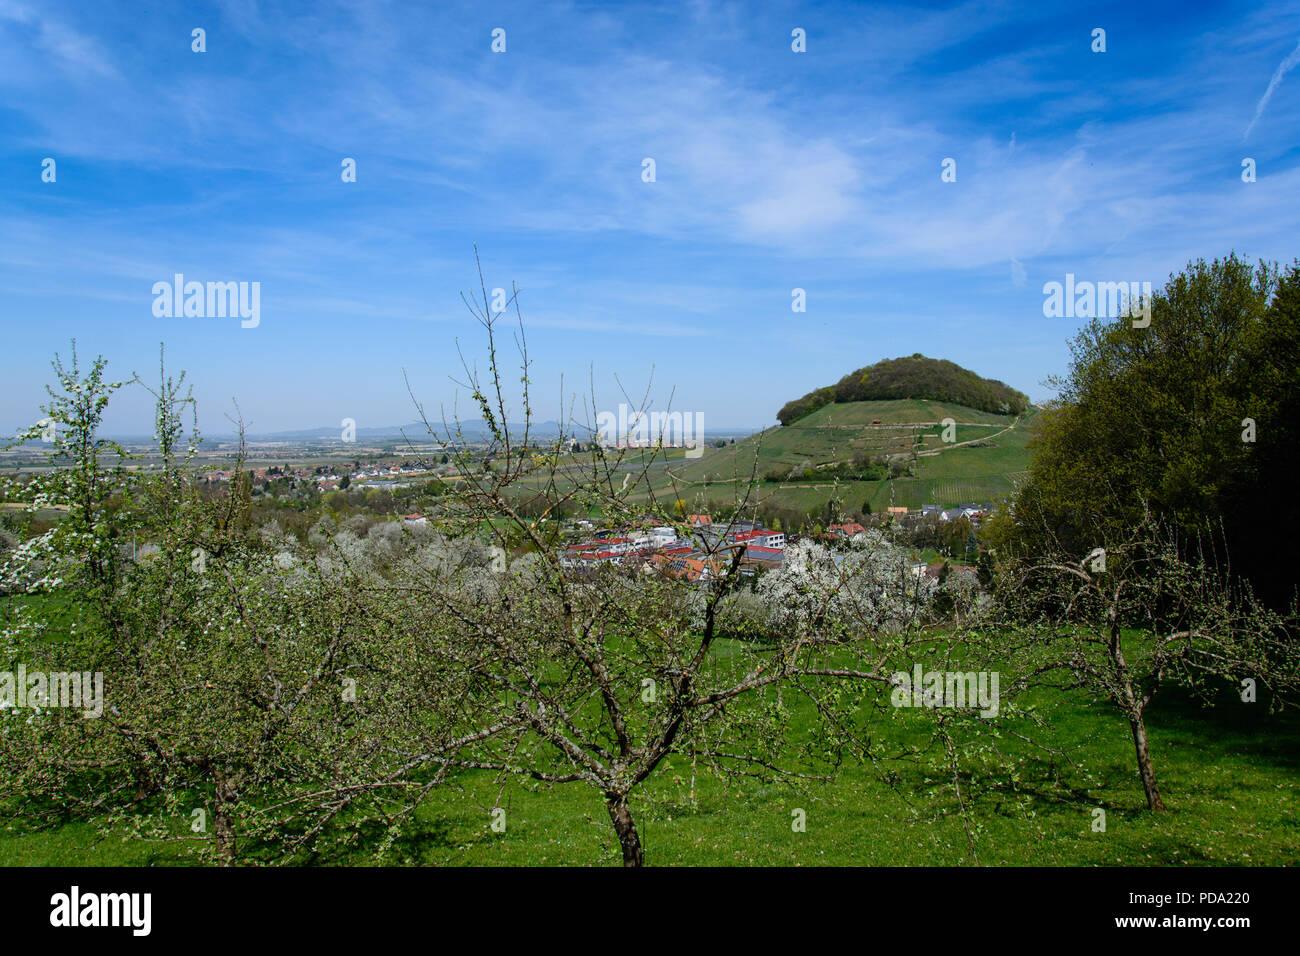 Grüne Wiesen, blauer Himmel Stockbild